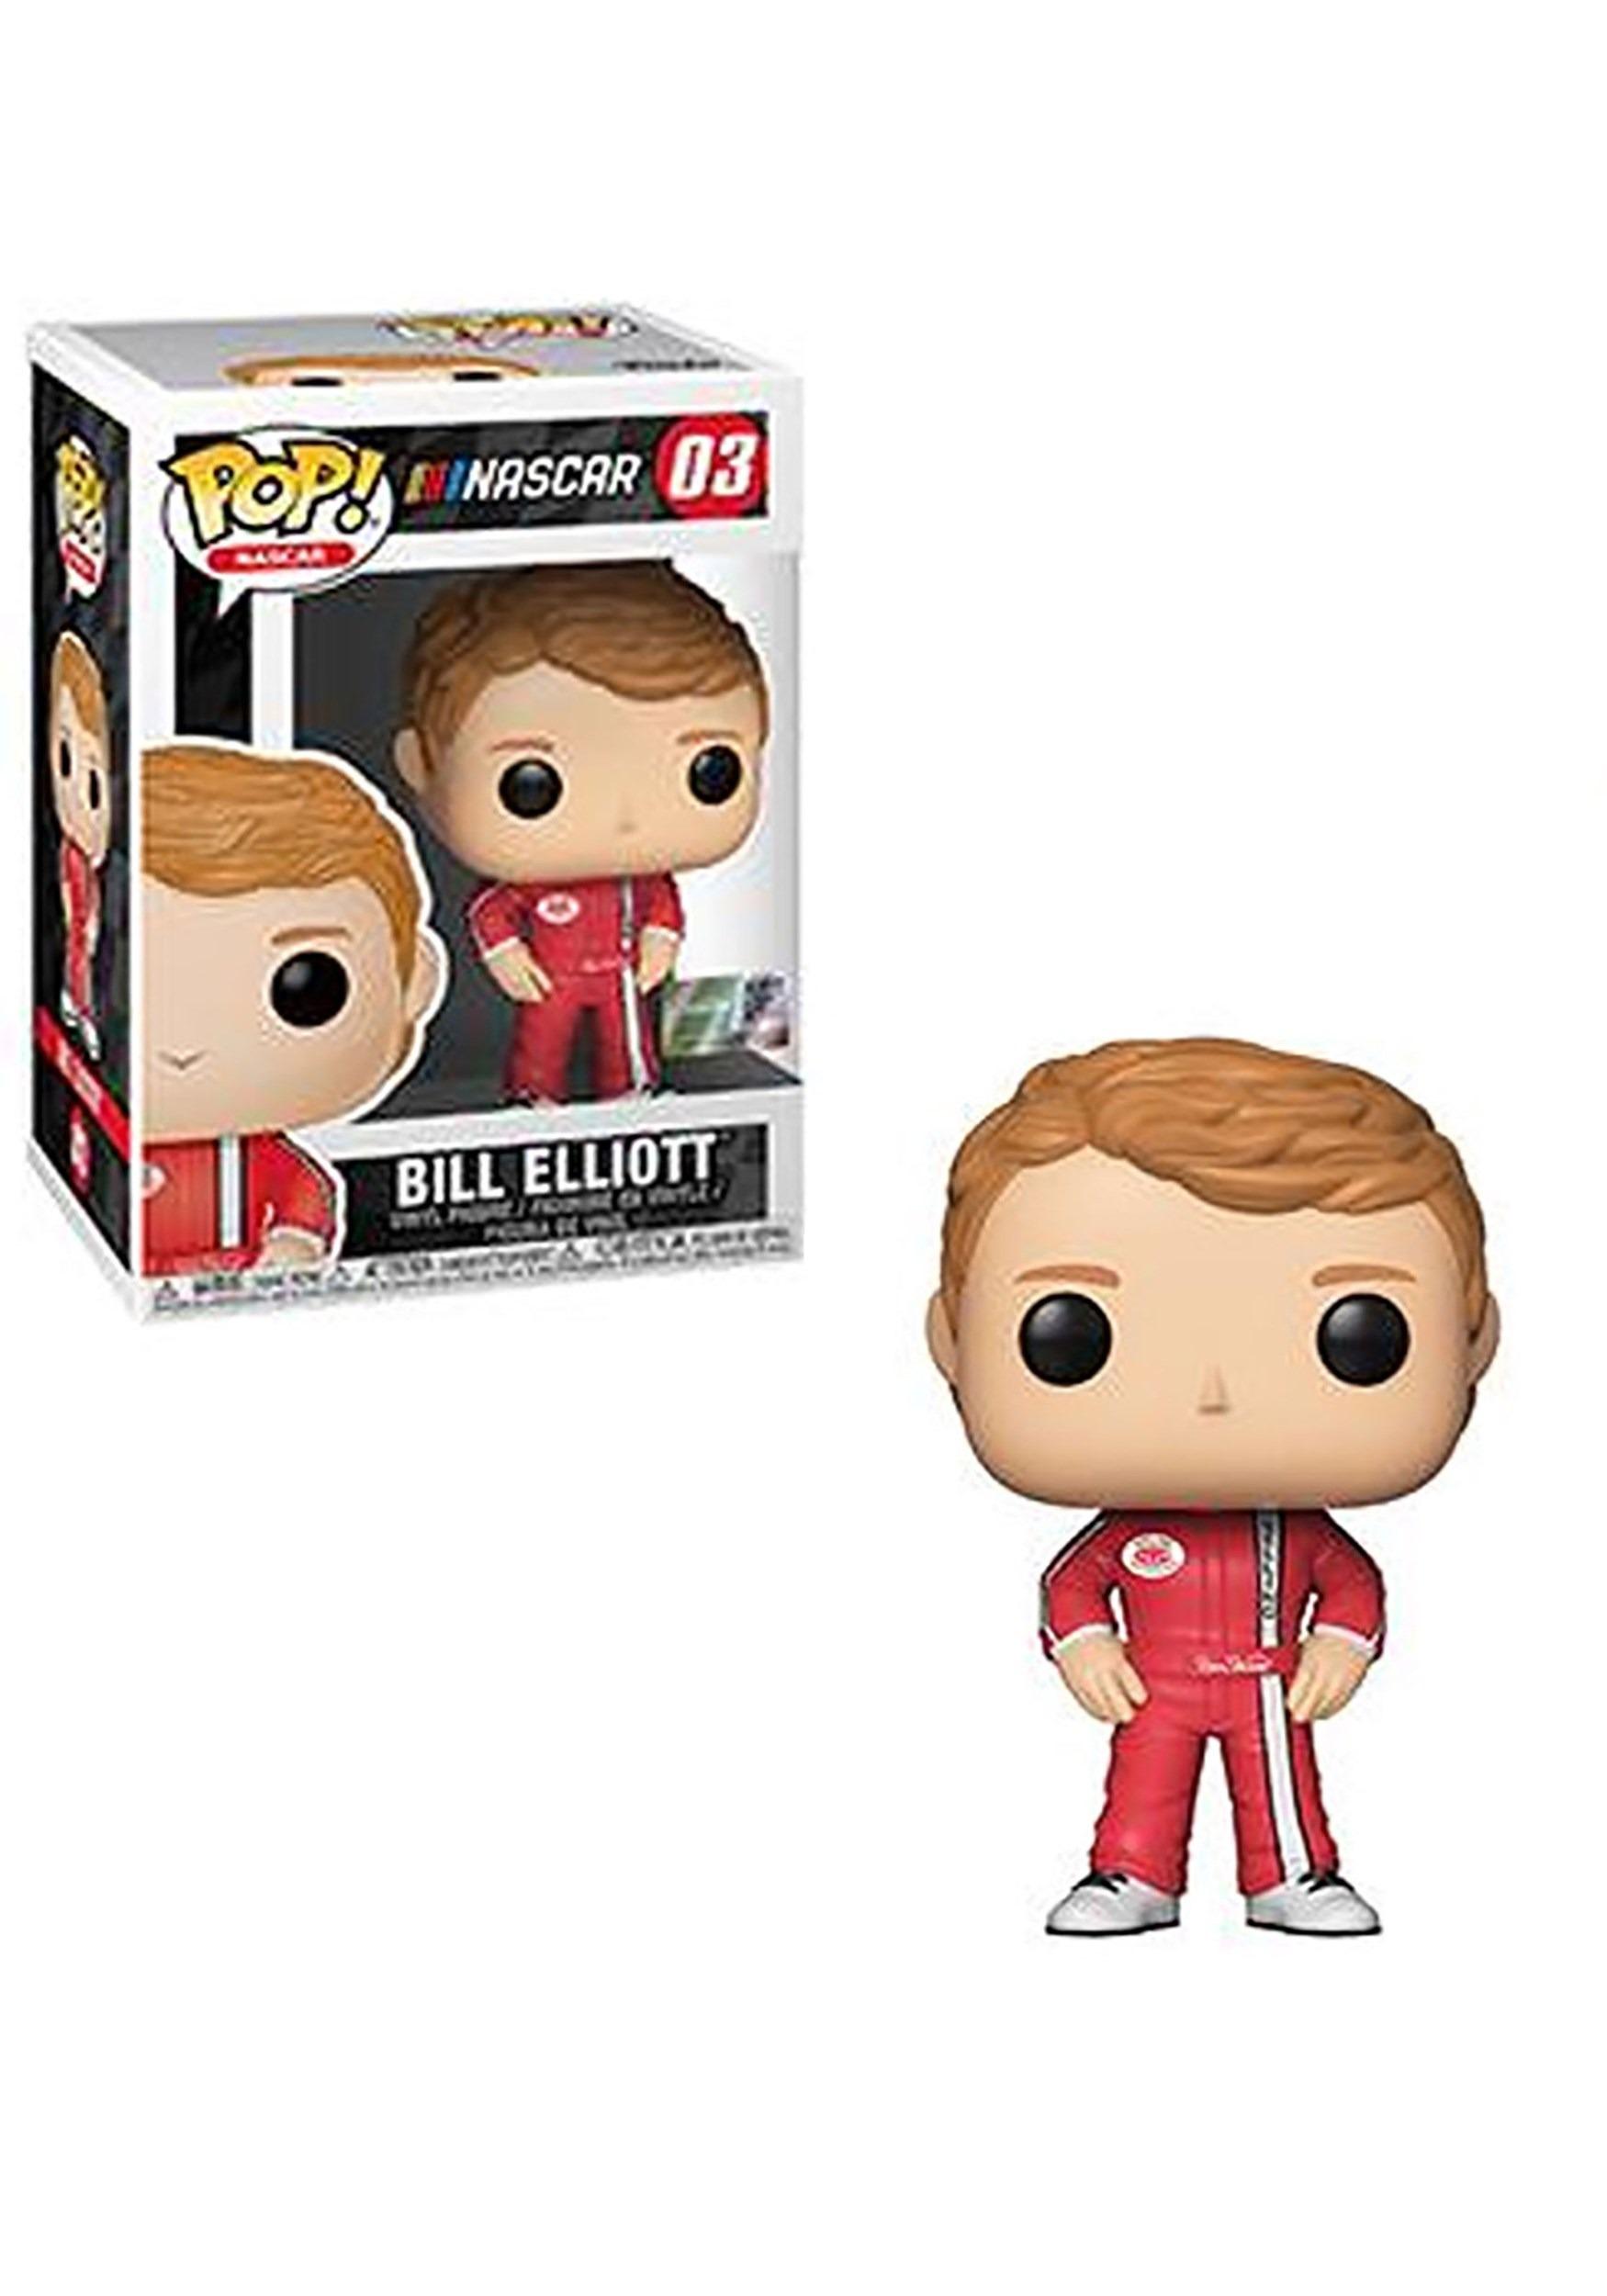 Bill Elliott - Pop! NASCAR Figurine